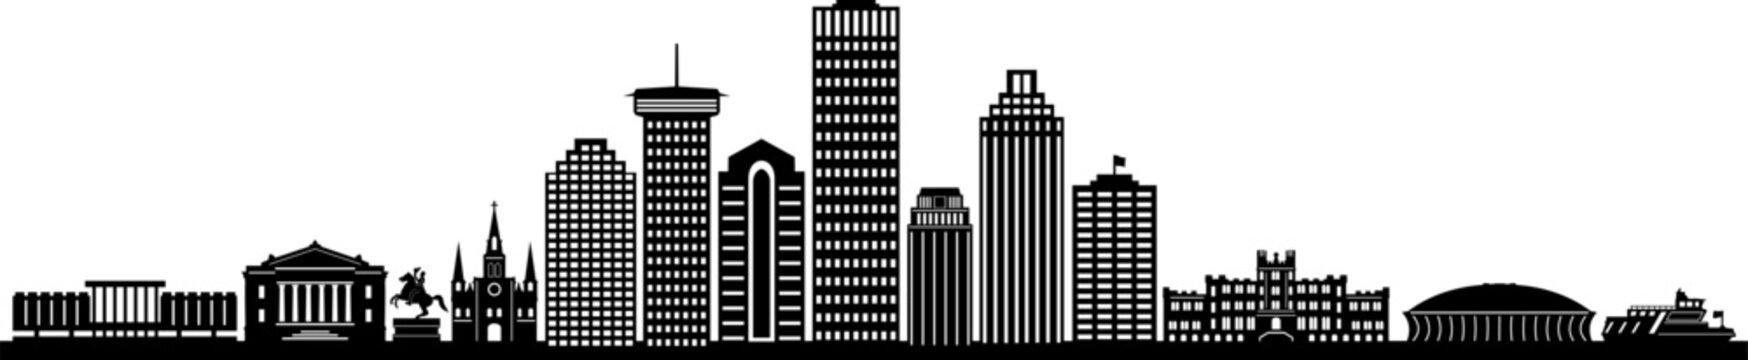 NEW ORLEANS LOUISIANA City Skyline Silhouette Cityscape Vector